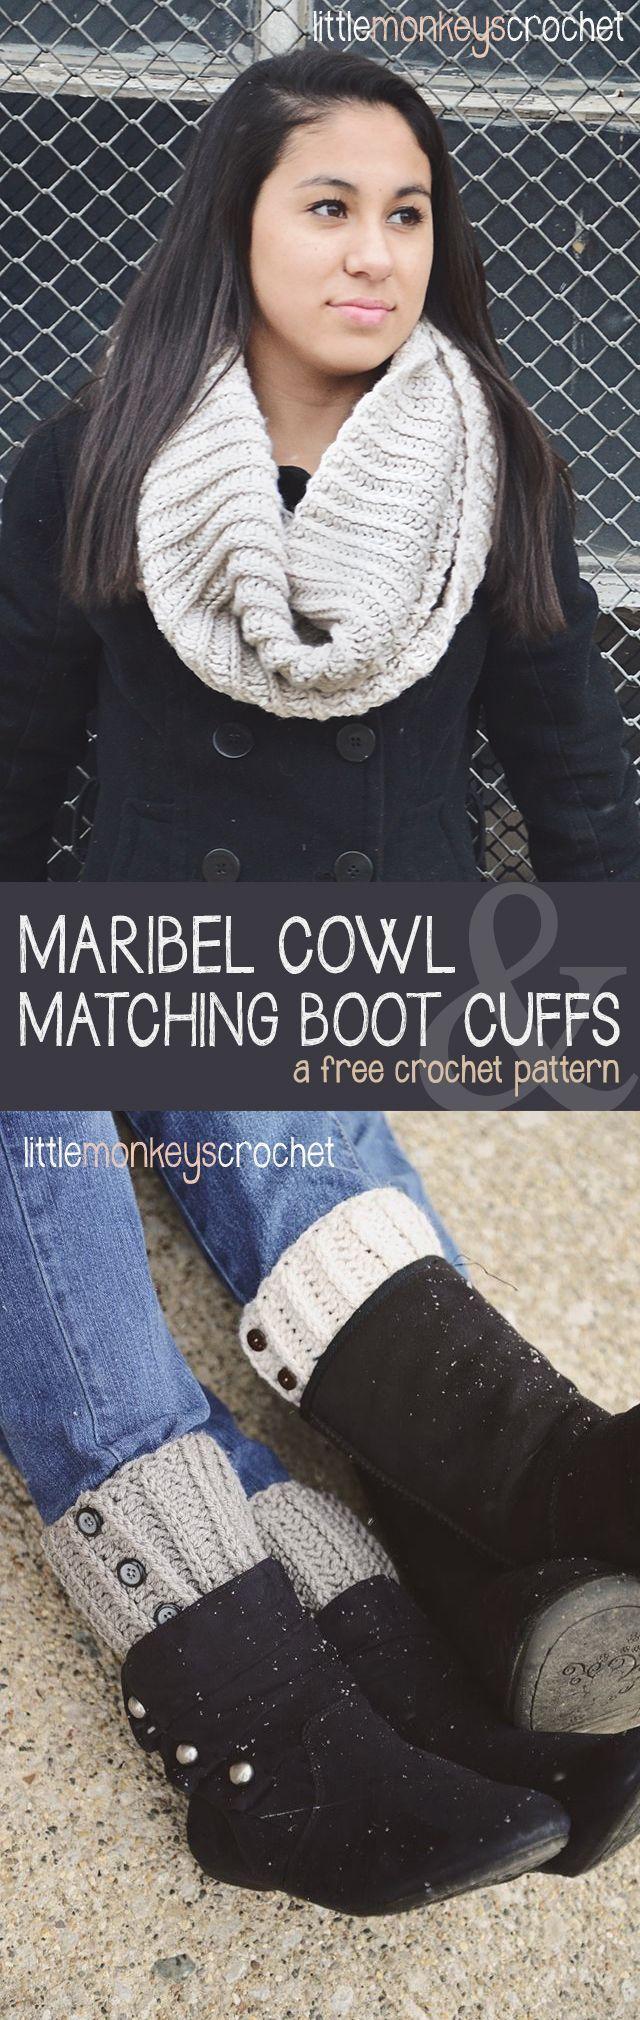 Mejores 24 imágenes de crochet bootcuffs en Pinterest   Ganchillo ...